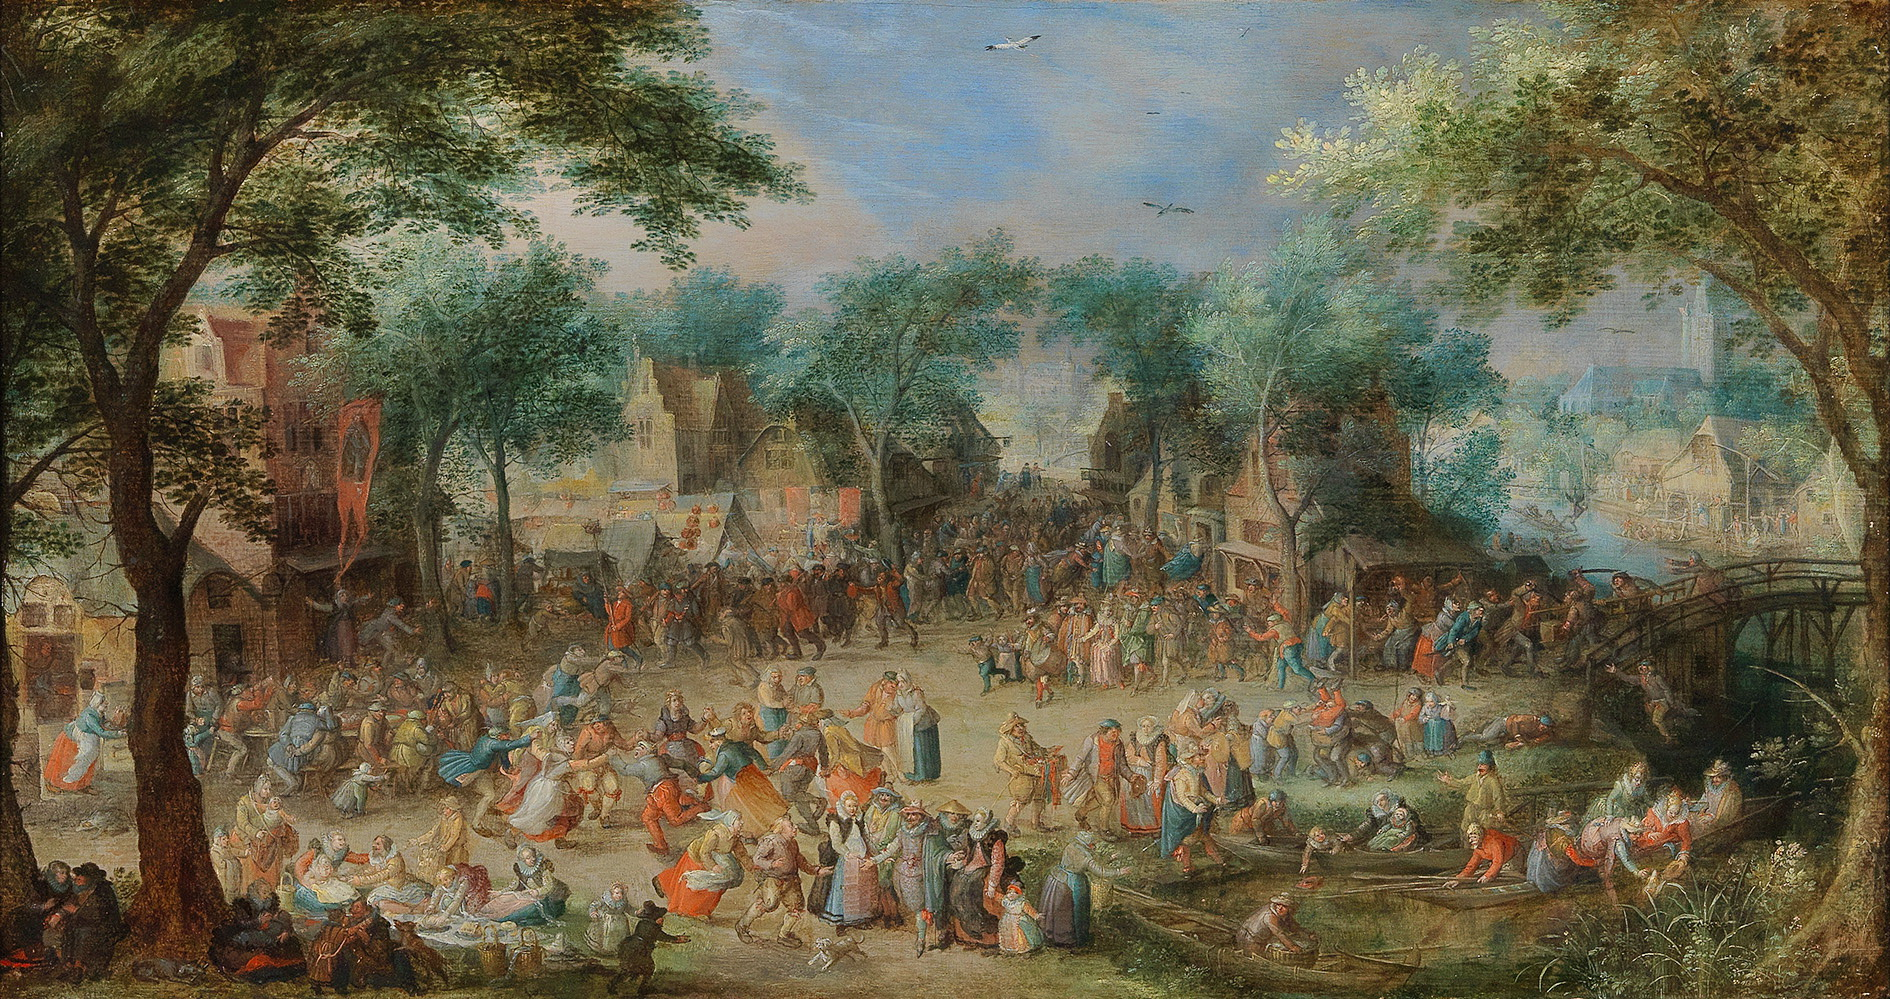 DAVID VINCKBOONS (1576 Micheln - um 1632 Amsterdam) - Kirchweihfest des heiligen Georg, Öl/Holz